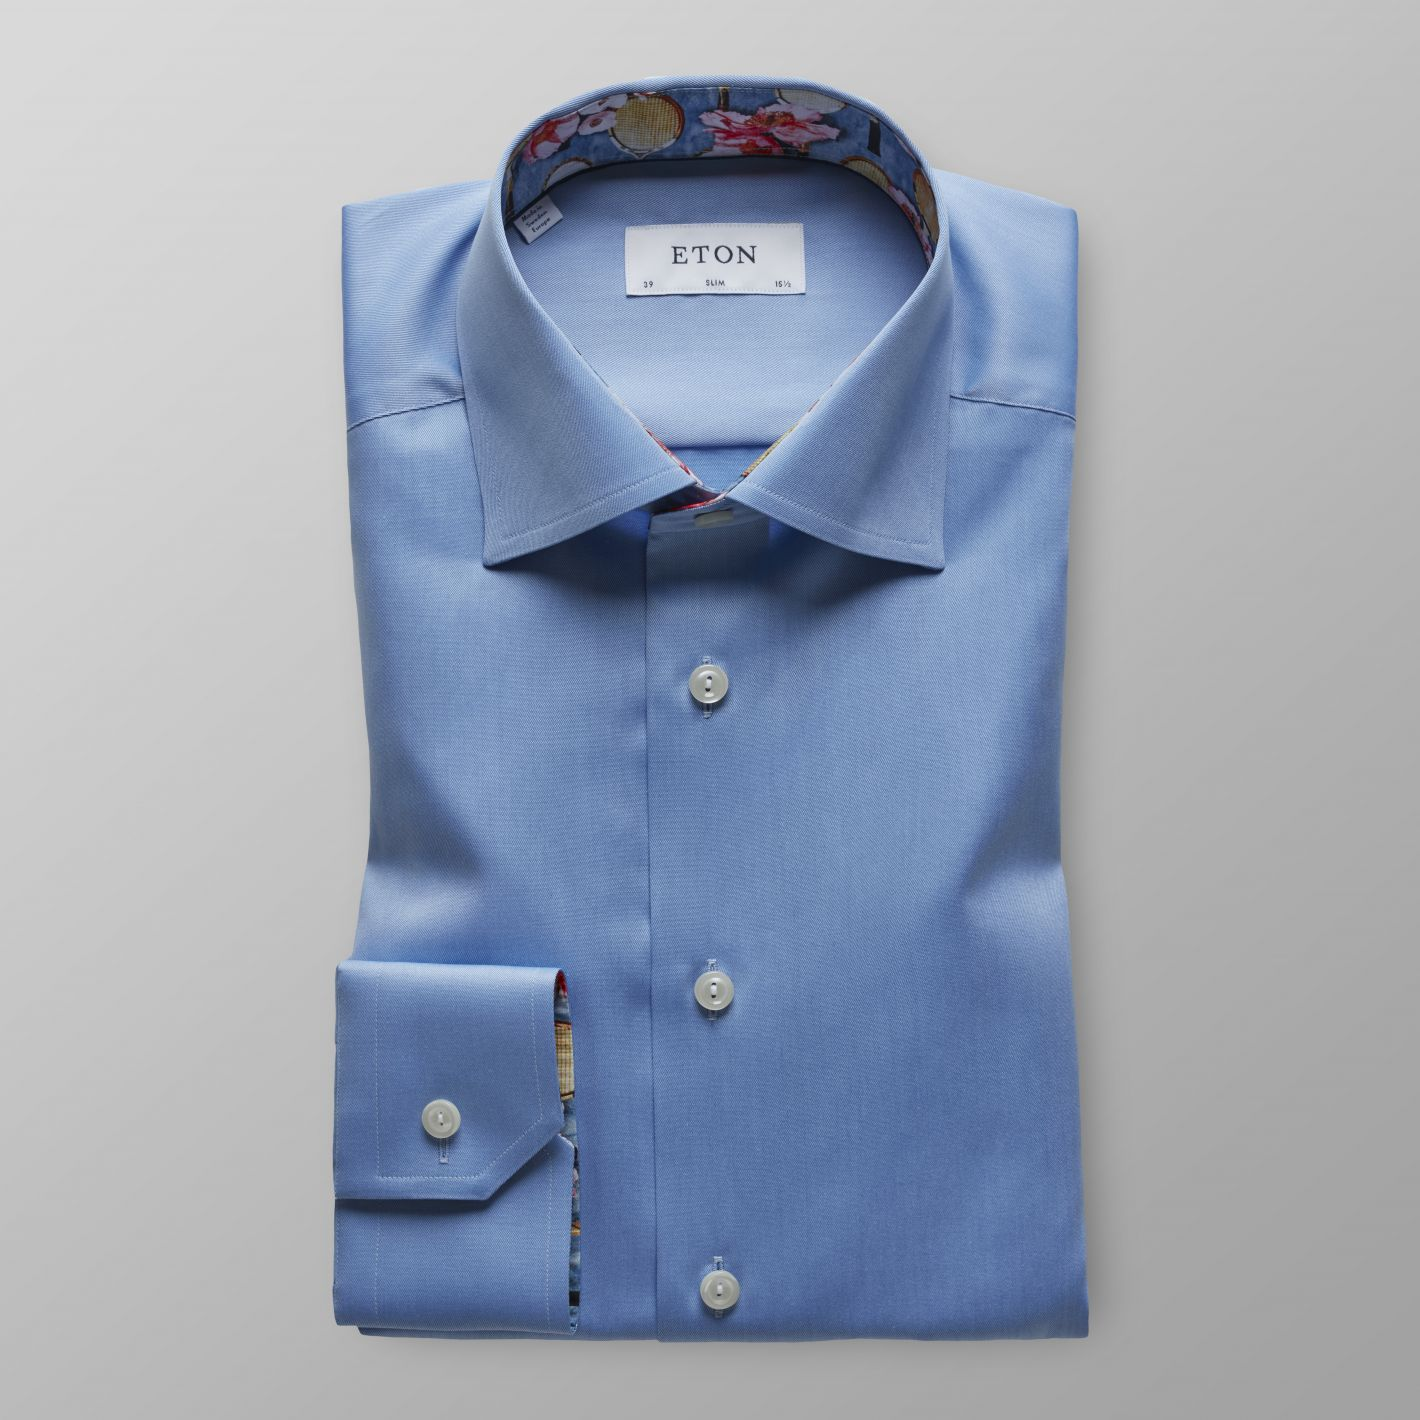 Sky Blue Twill Shirt - Tennis Print Details